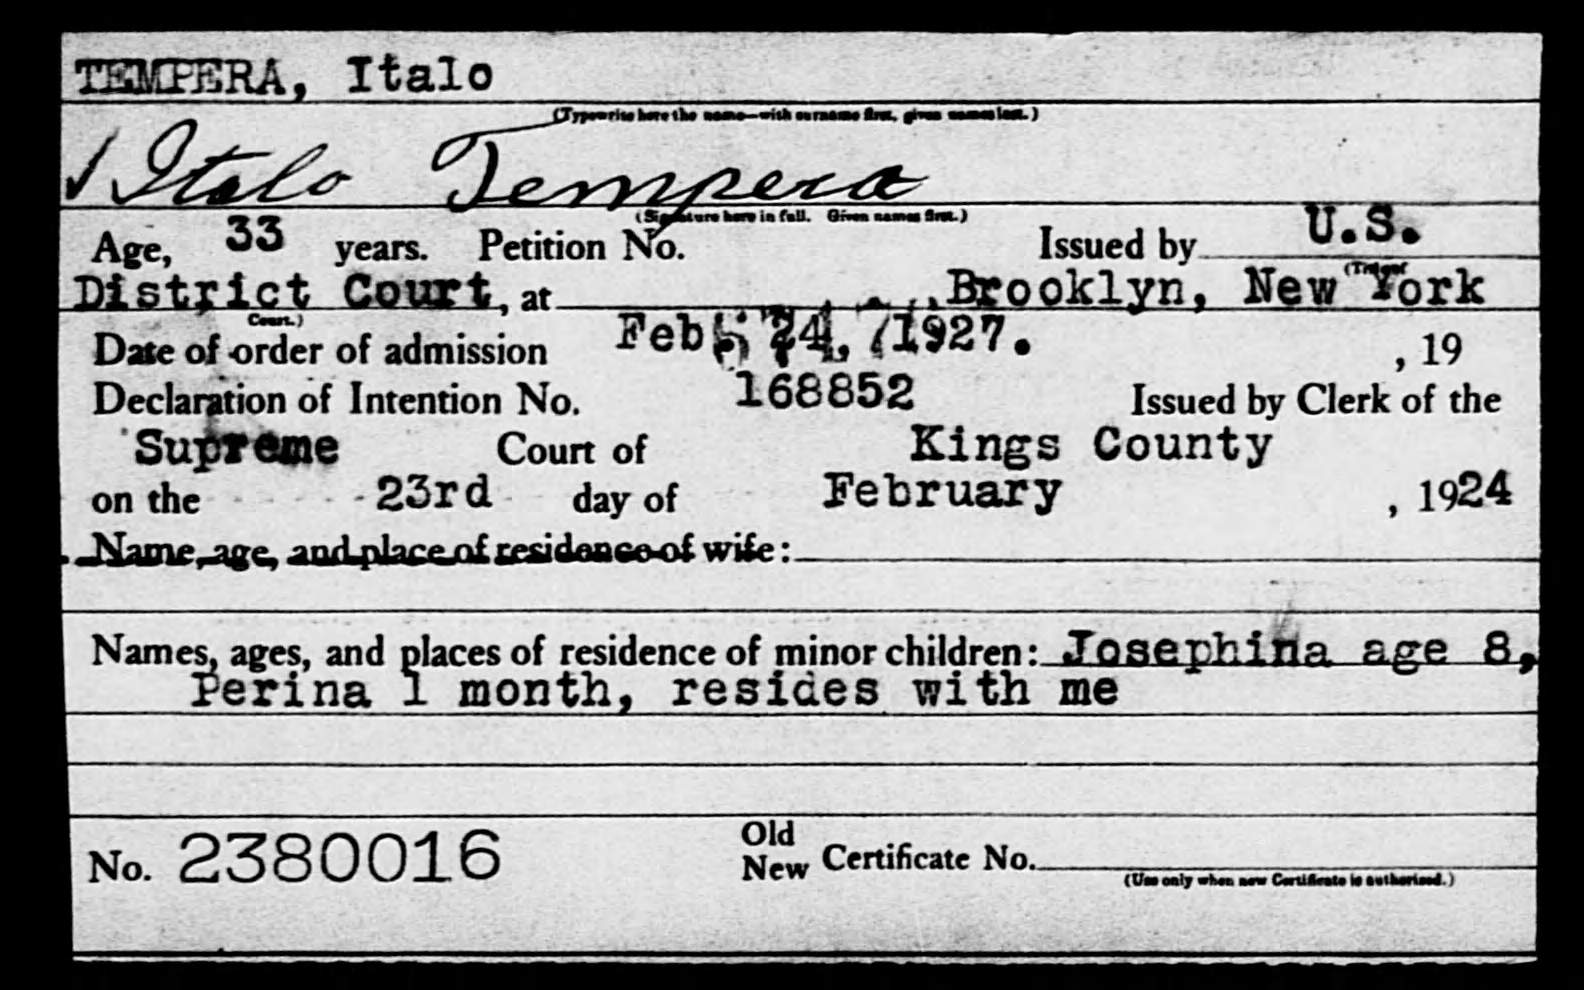 TEMPERA, Italo - Born: [BLANK], Naturalized: 1927